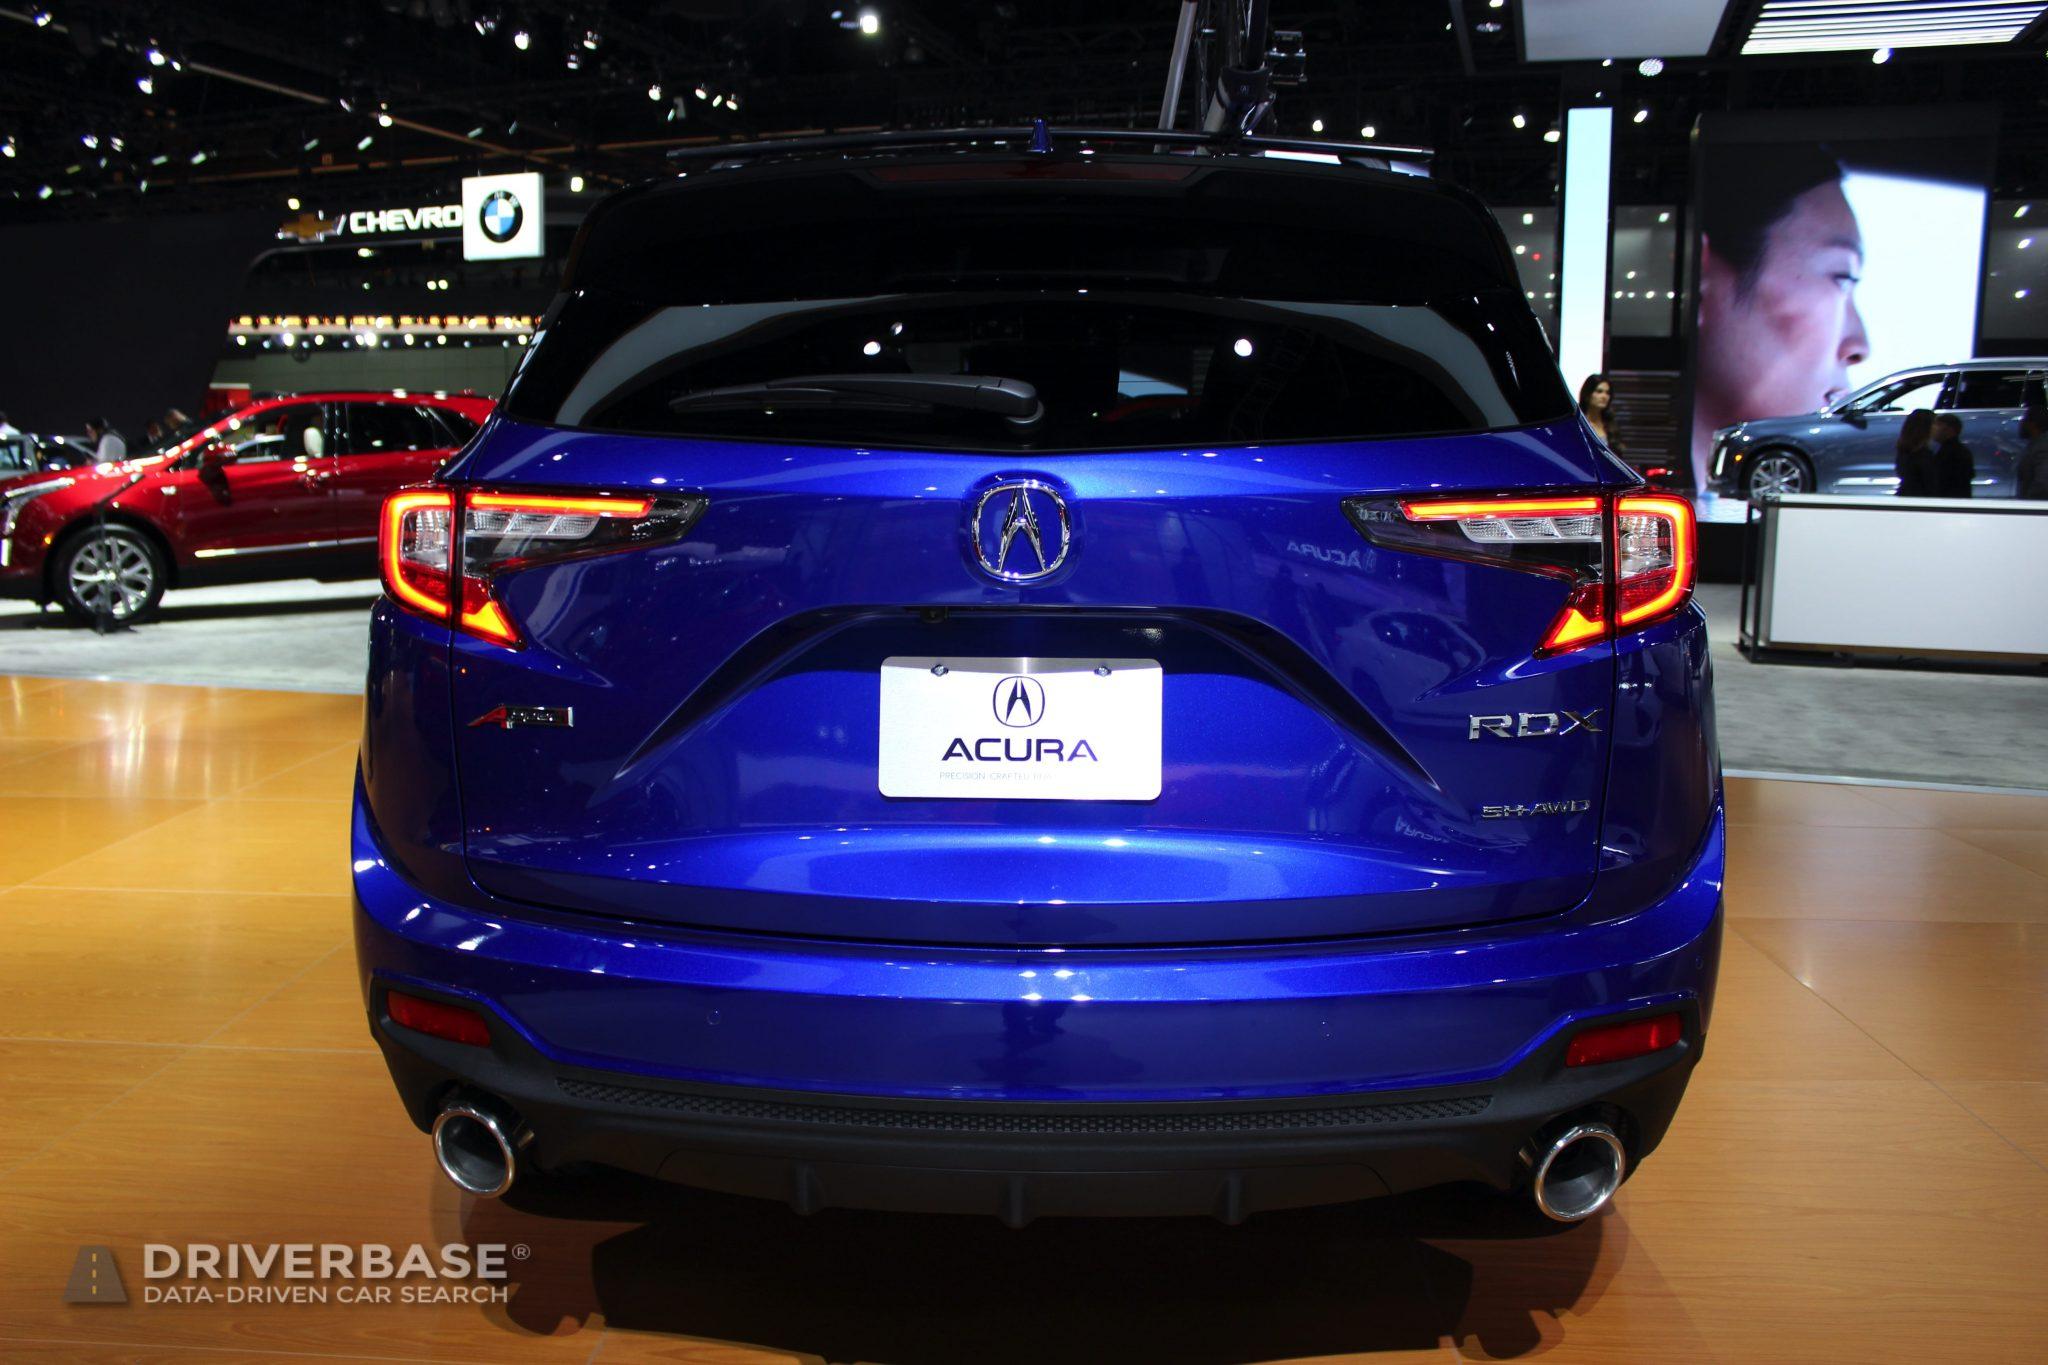 2020 Acura RDX SH AWD at the 2019 Los Angeles Auto Show